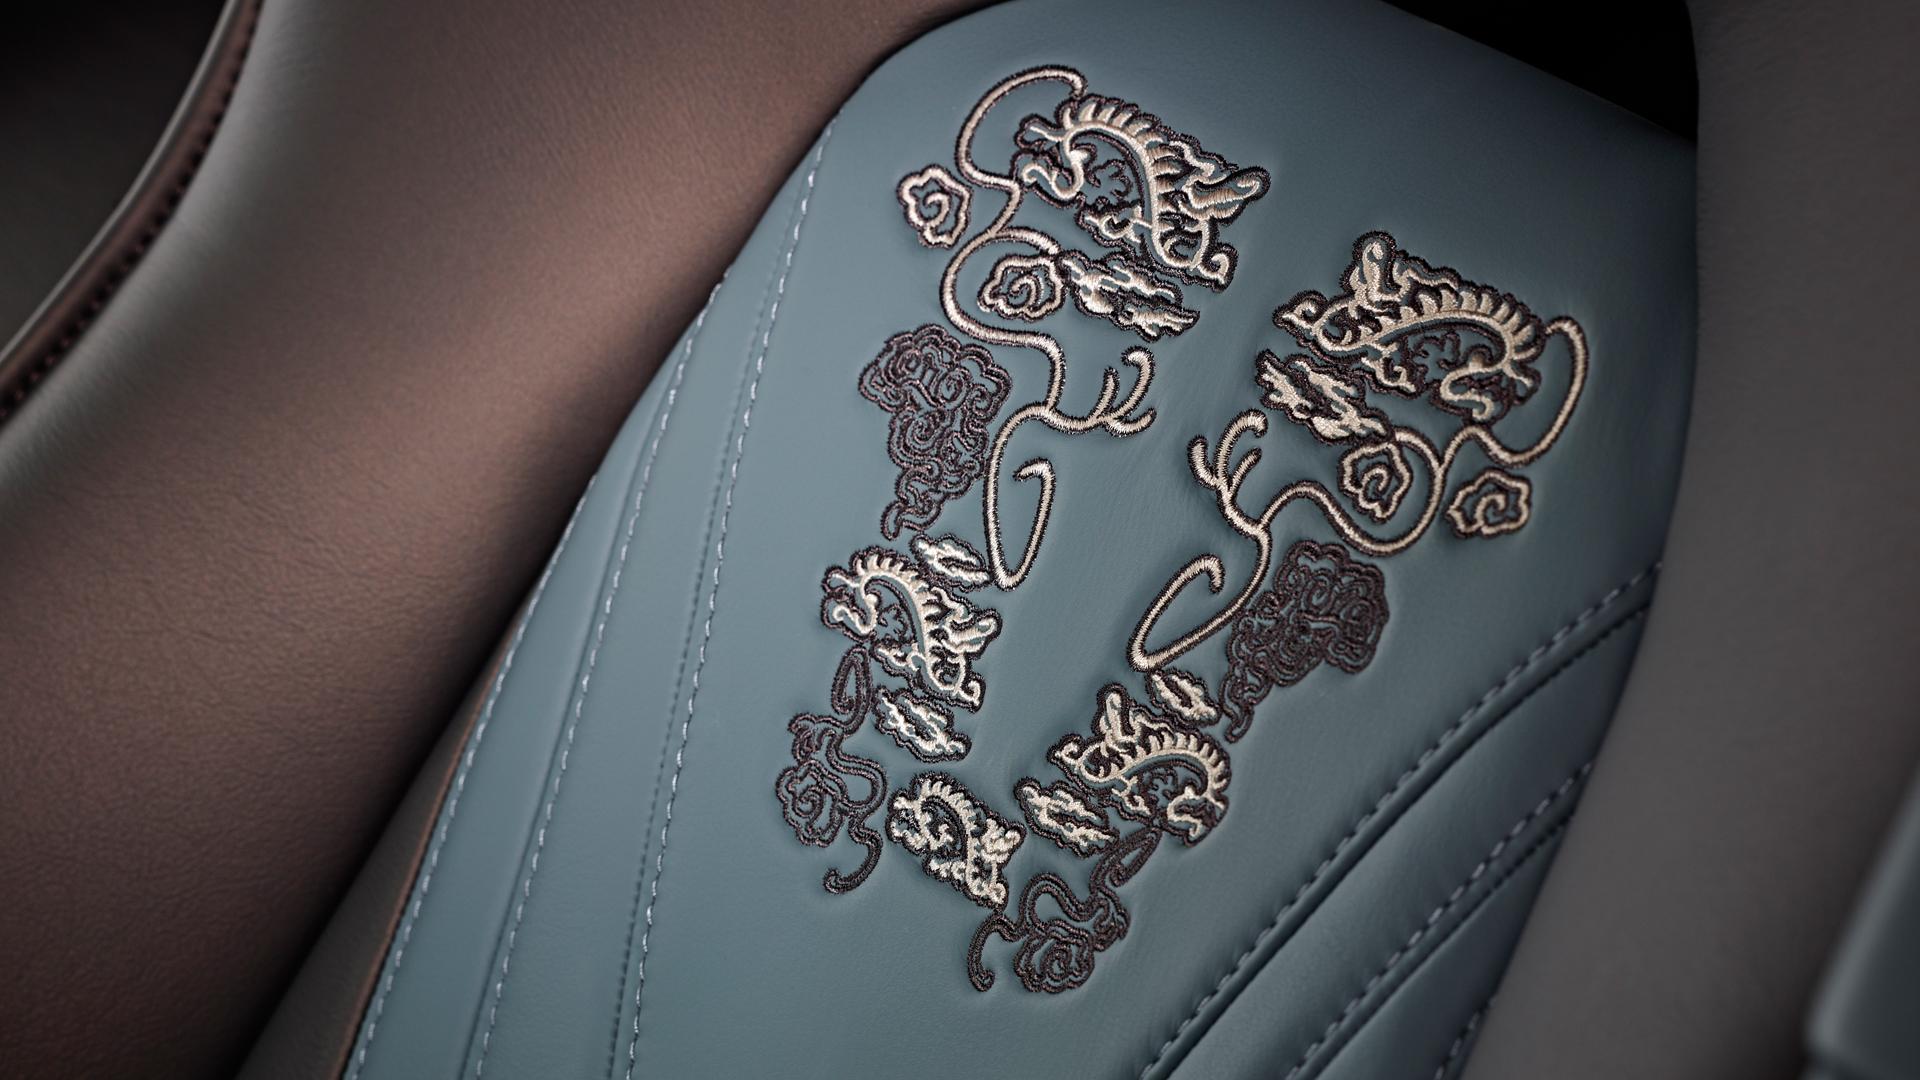 q by aston martin subtle customizations